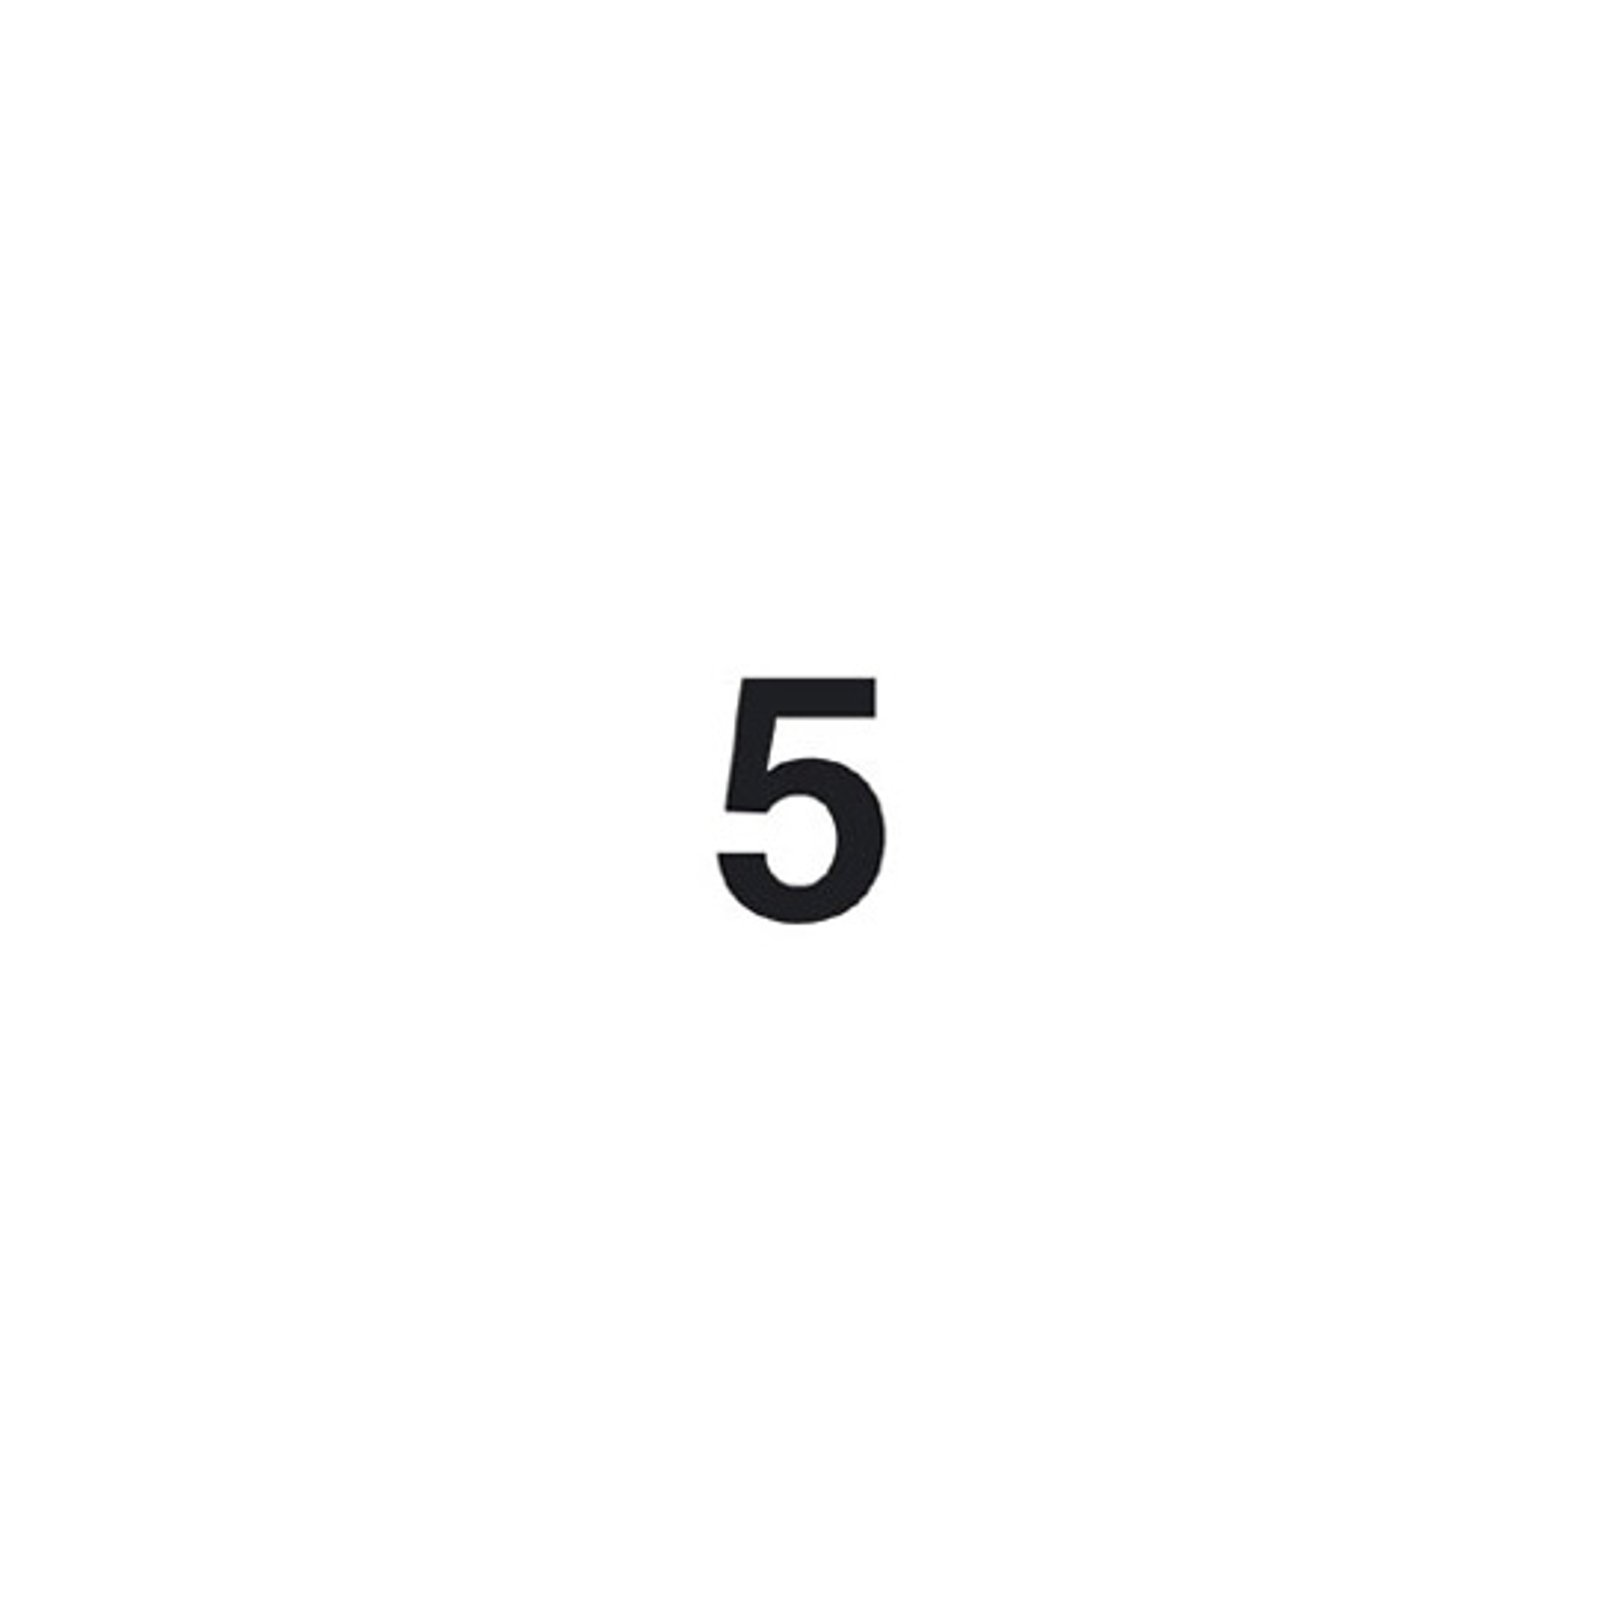 Selvklebende tallet 5